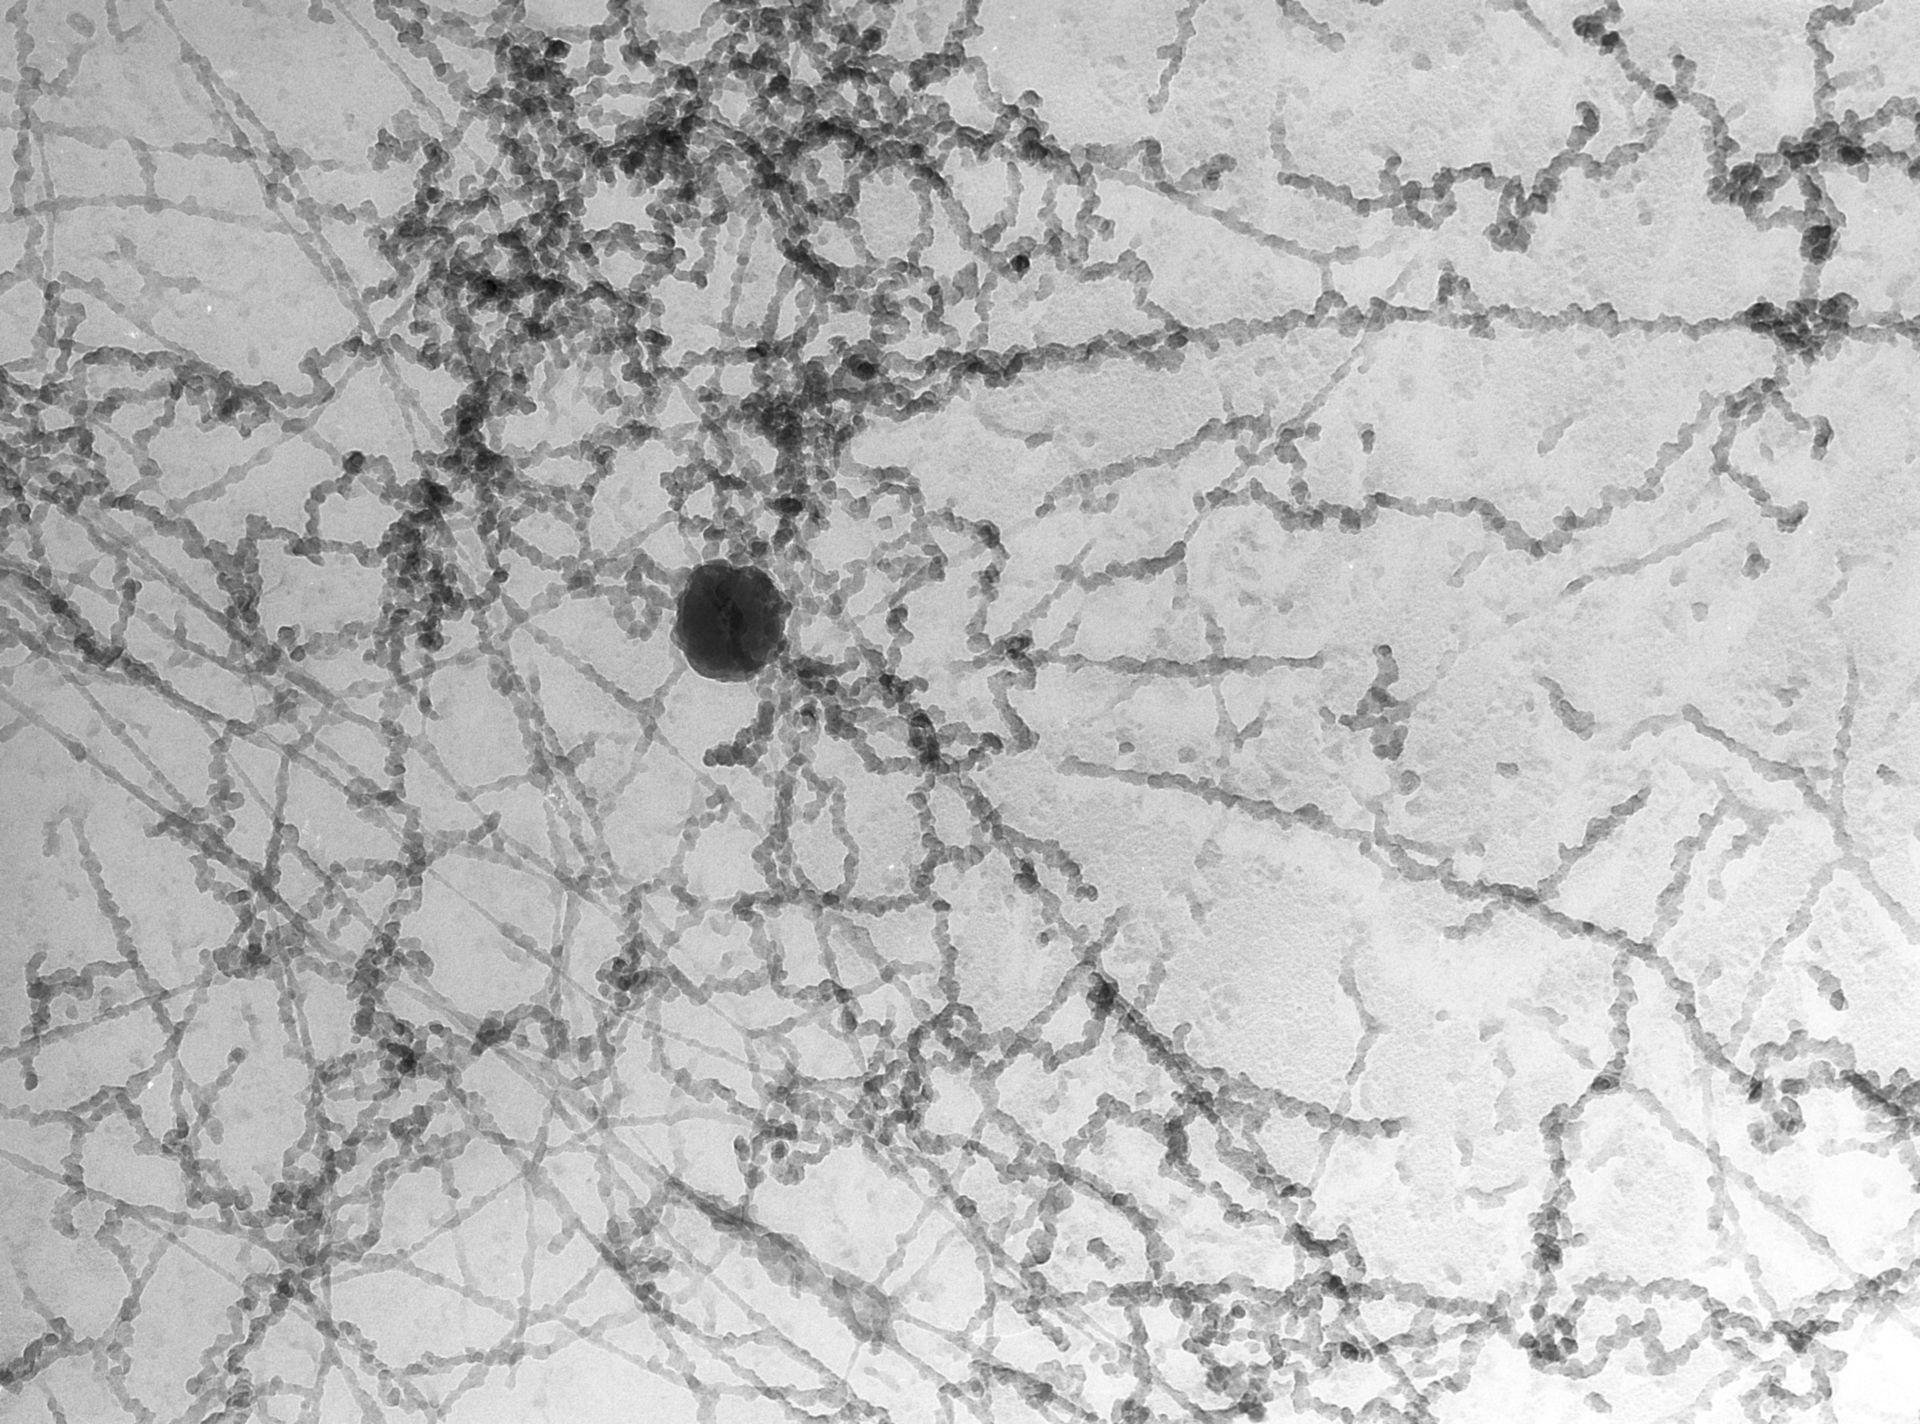 Notopthalmus viridescence (Nuclear chromatin) - CIL:10088